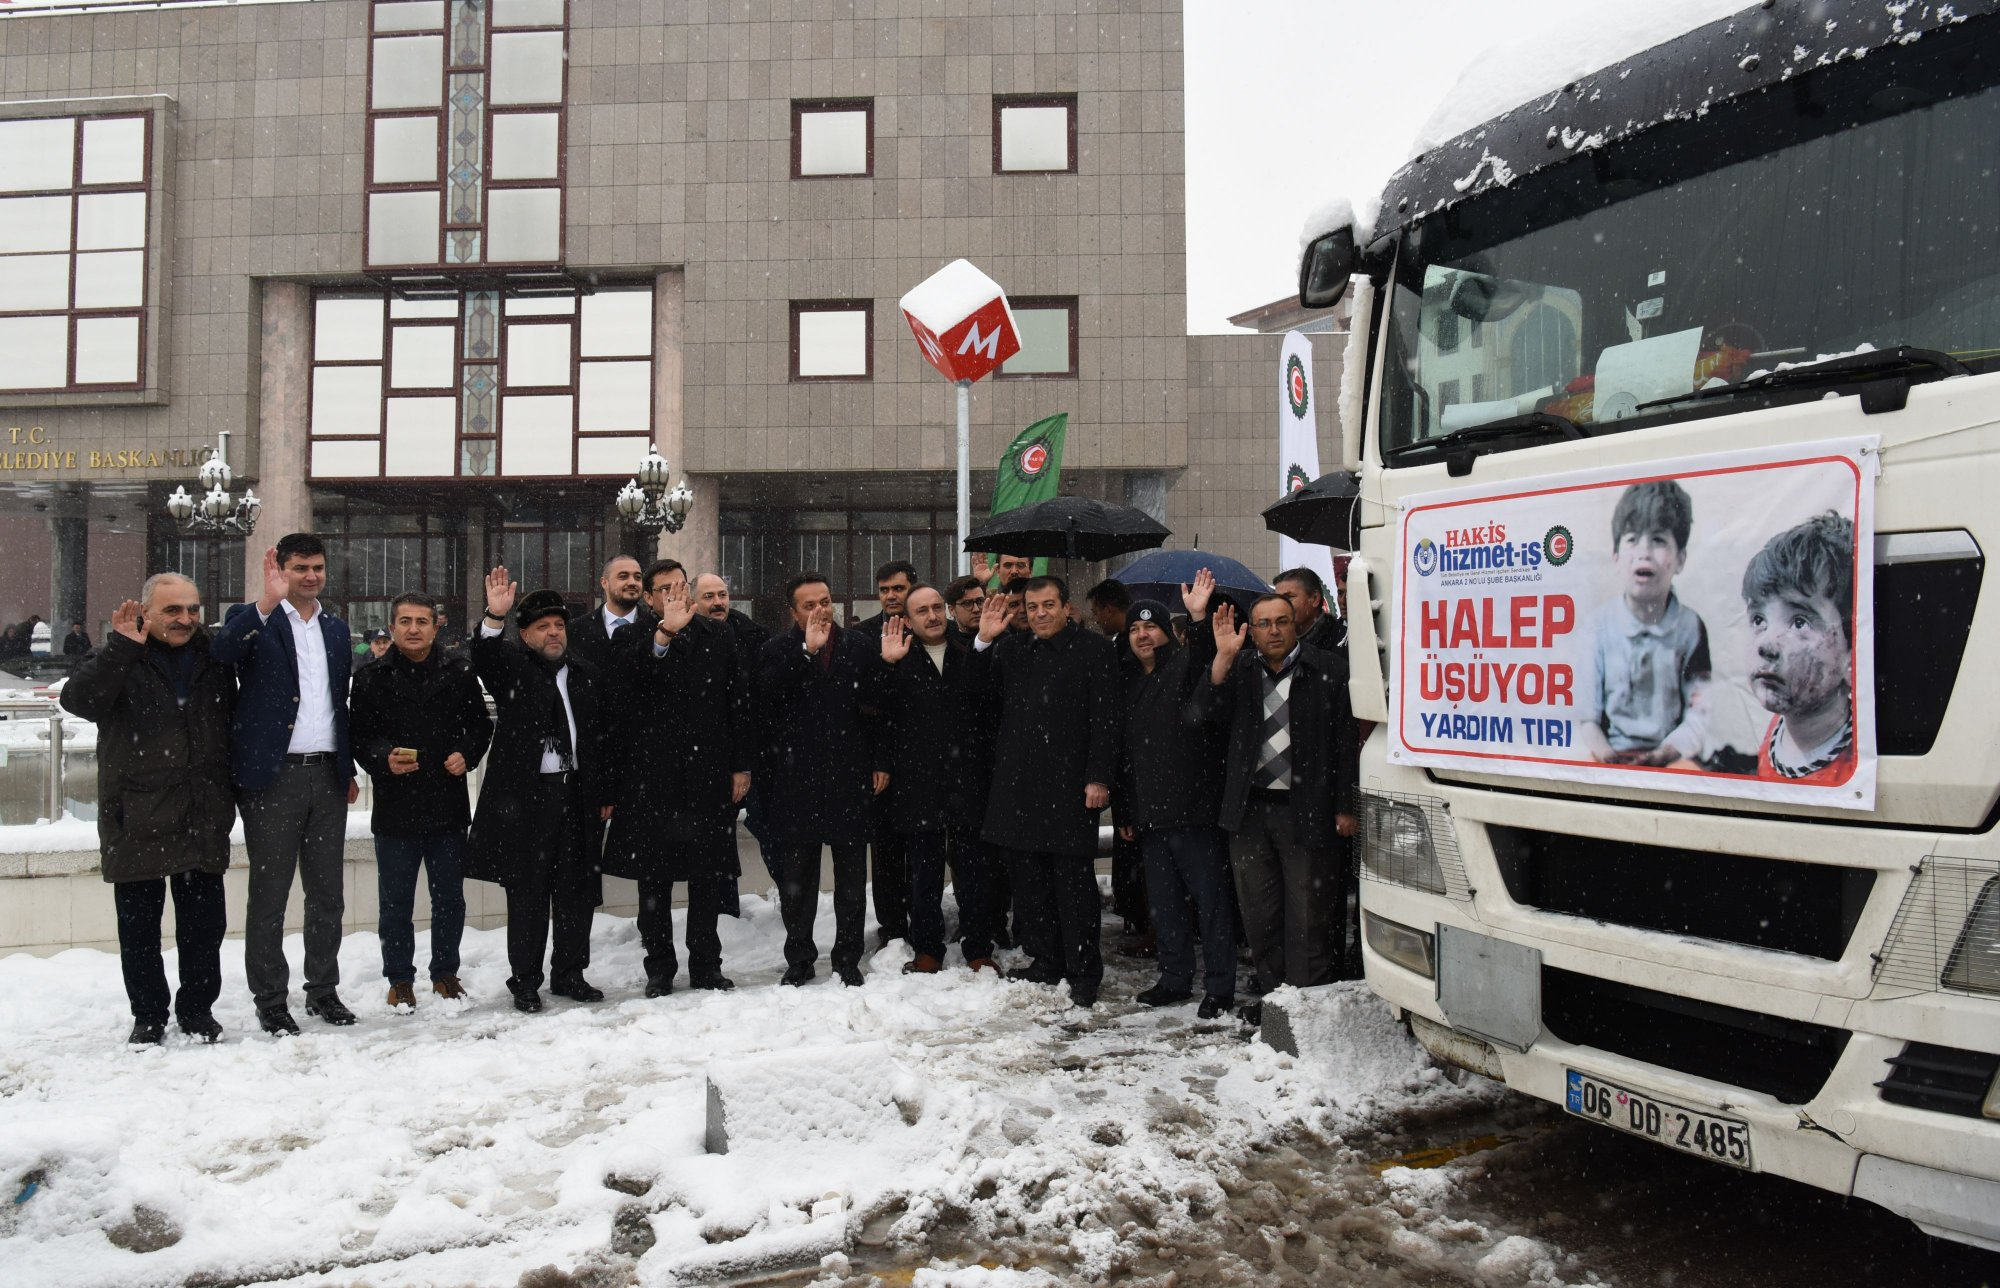 HAK-İŞ'TEN HALEP'E YARDIM TIRI